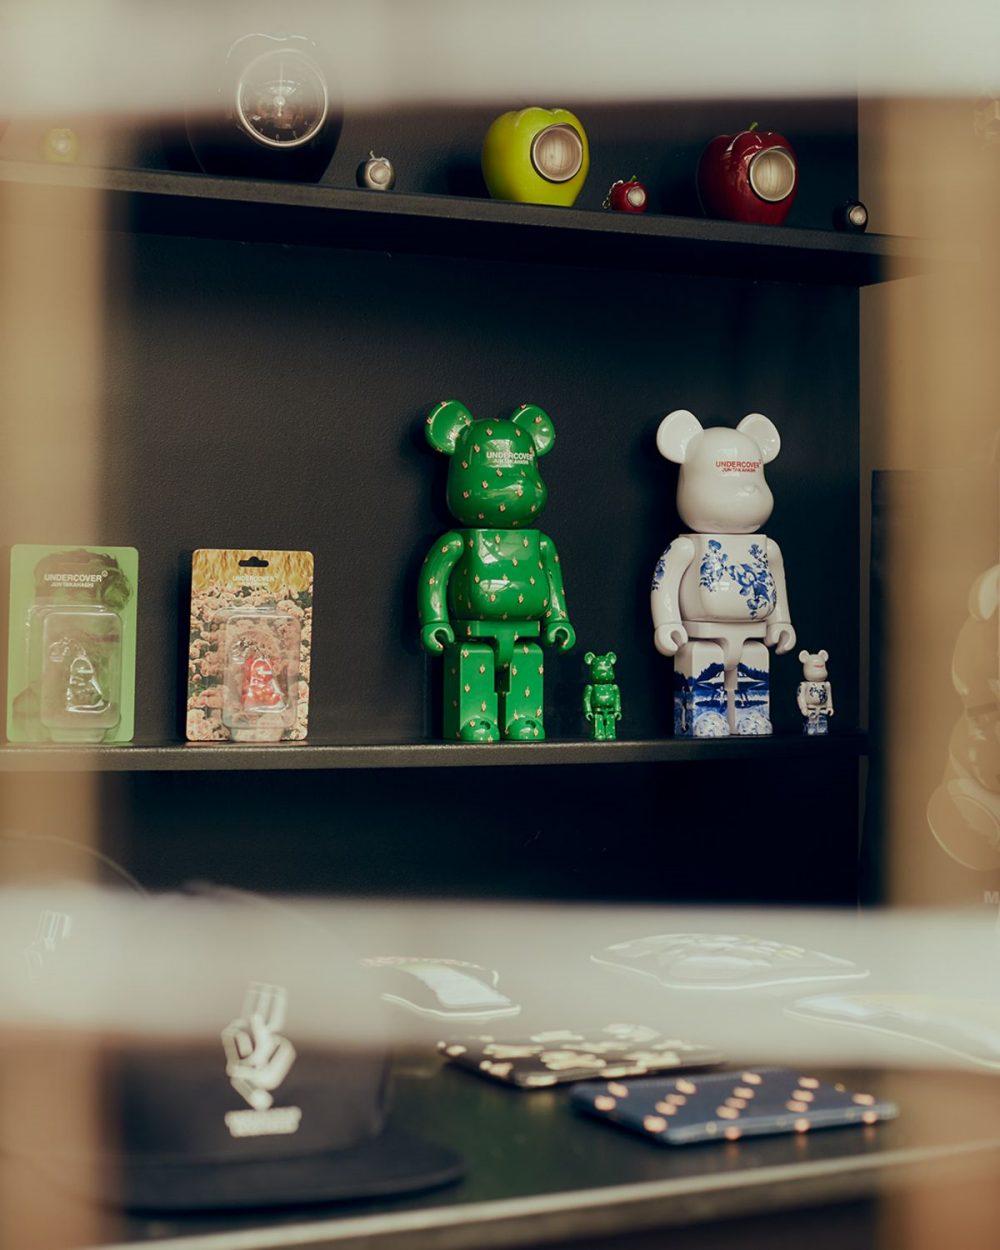 be rbrick on cabinet - MR PORTER 推出 Super Mart 企划,凑集各知名品牌的标志性产品!